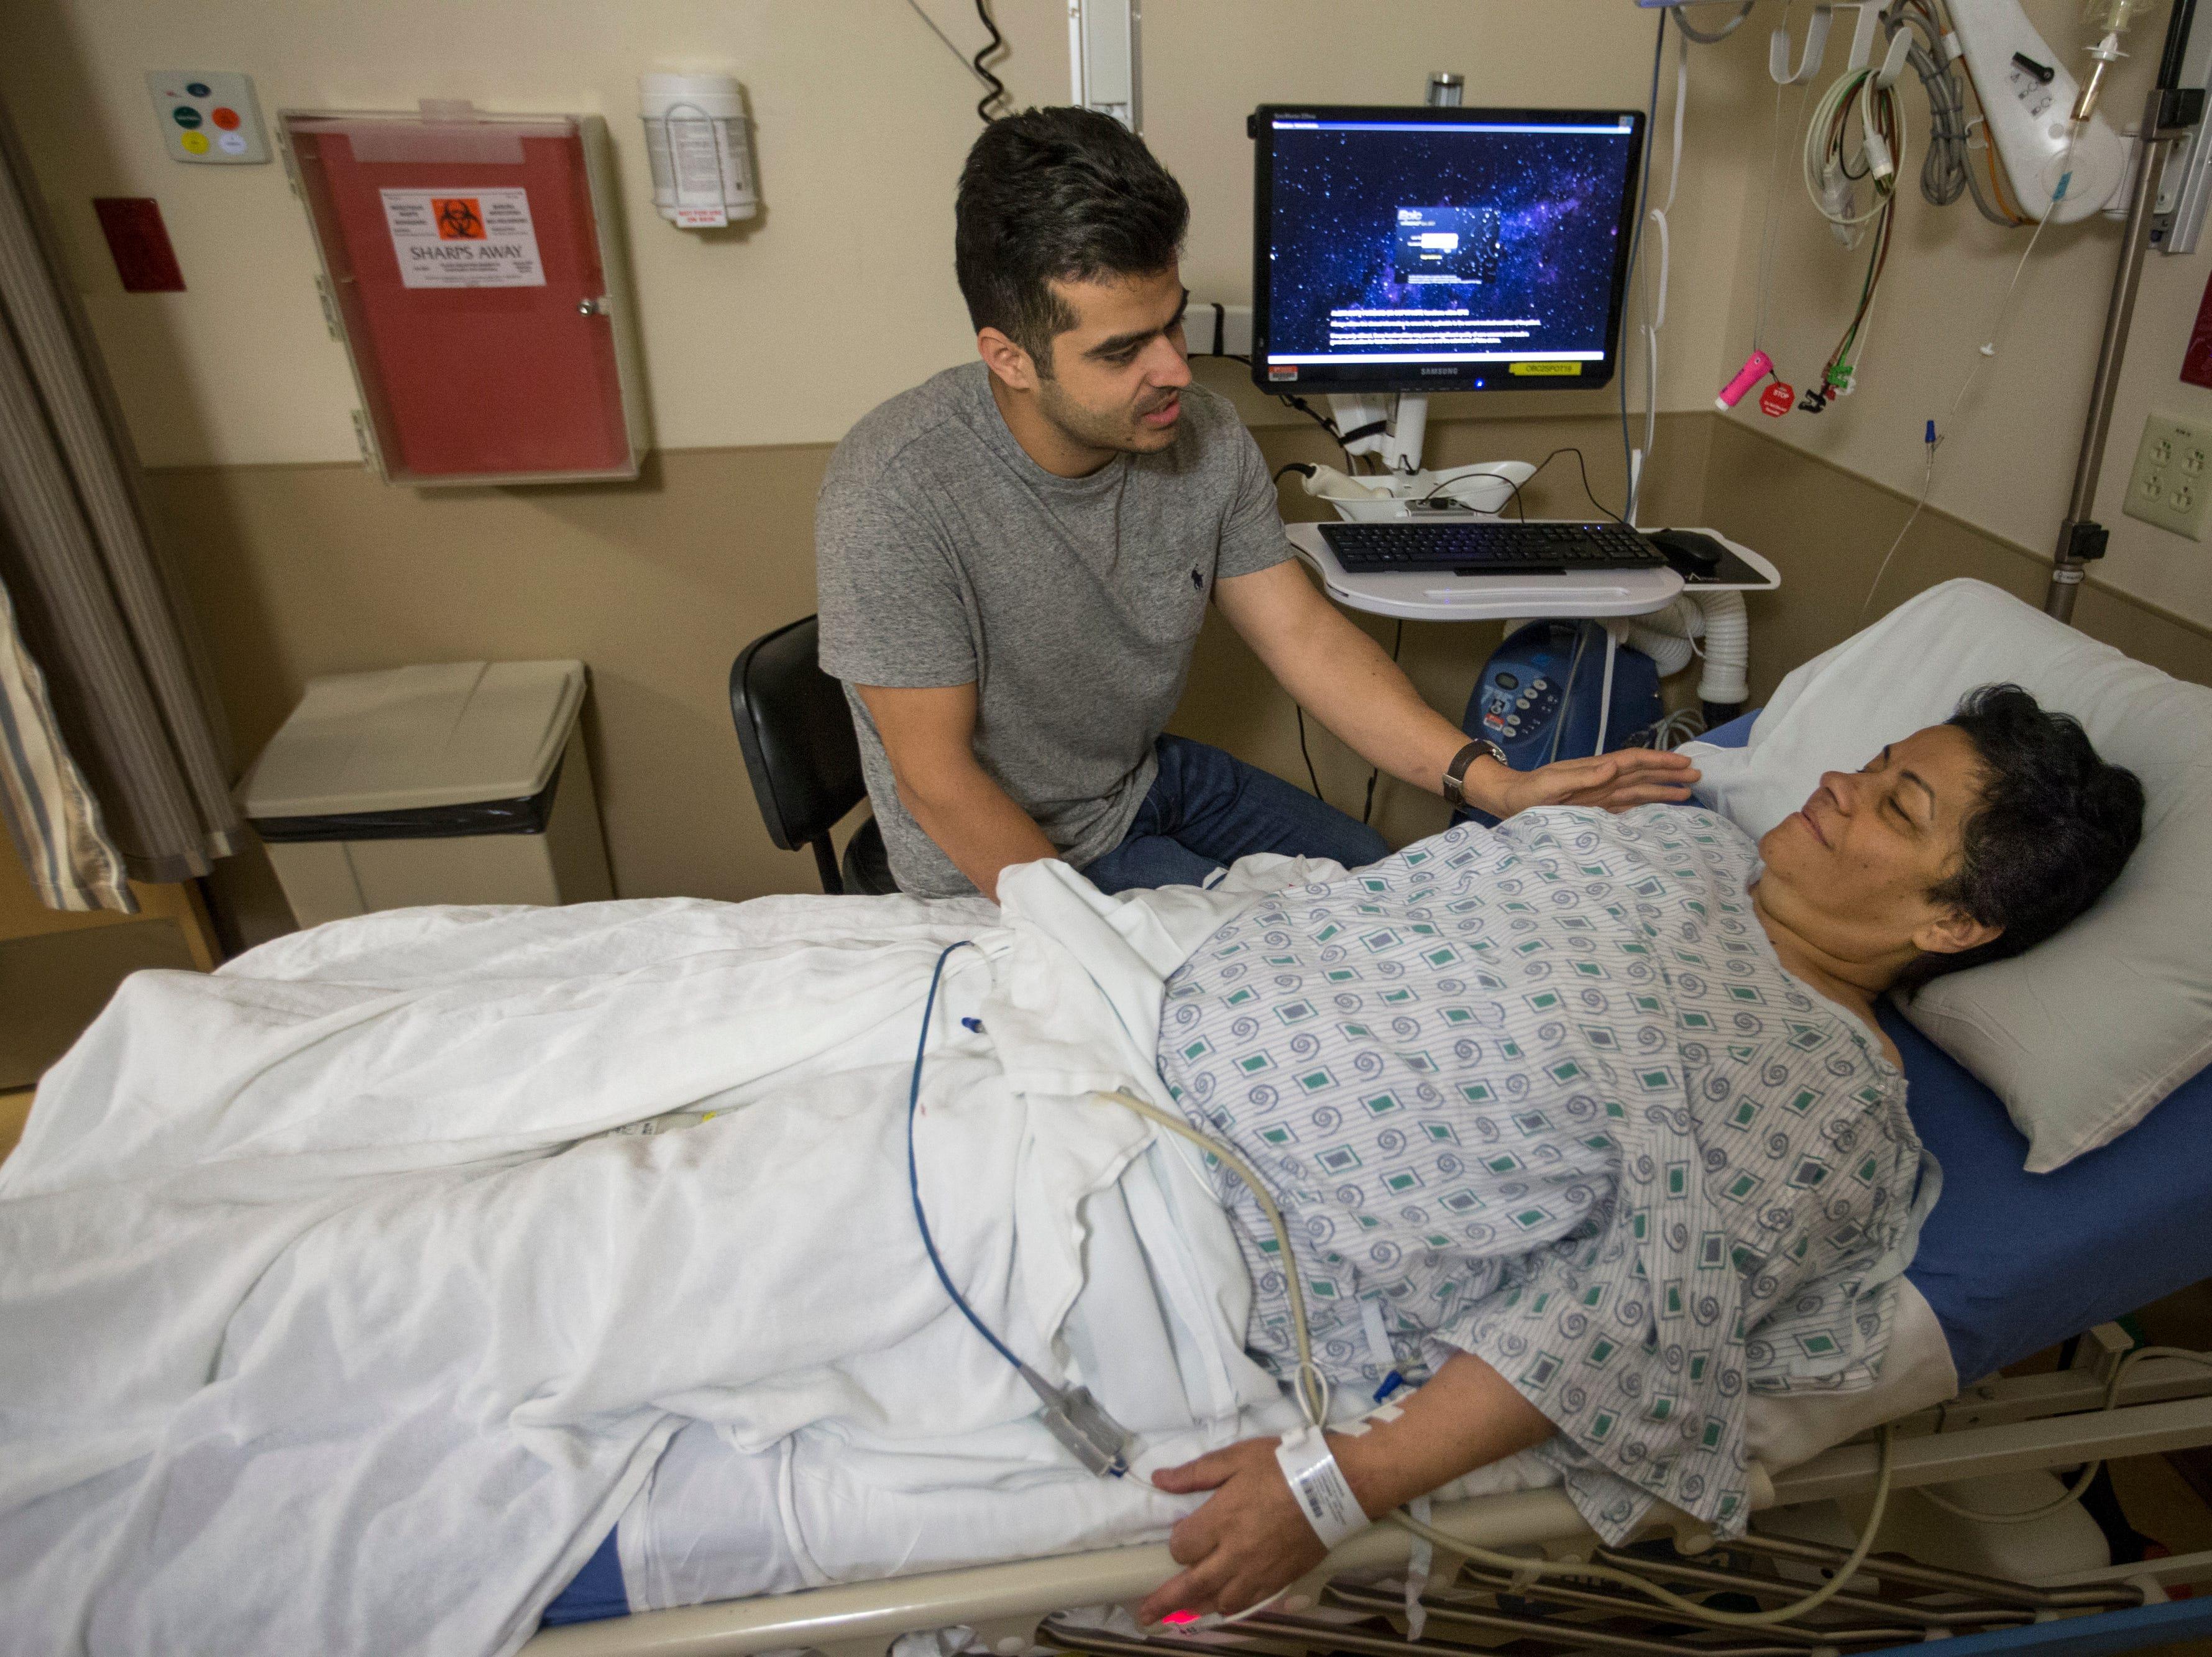 Mehran Jafari comforts his mother, Marzieh Taheri, as she awaits treatment for radiation necrosis at Norton Brownsboro Hospital. Aug. 30, 2018.